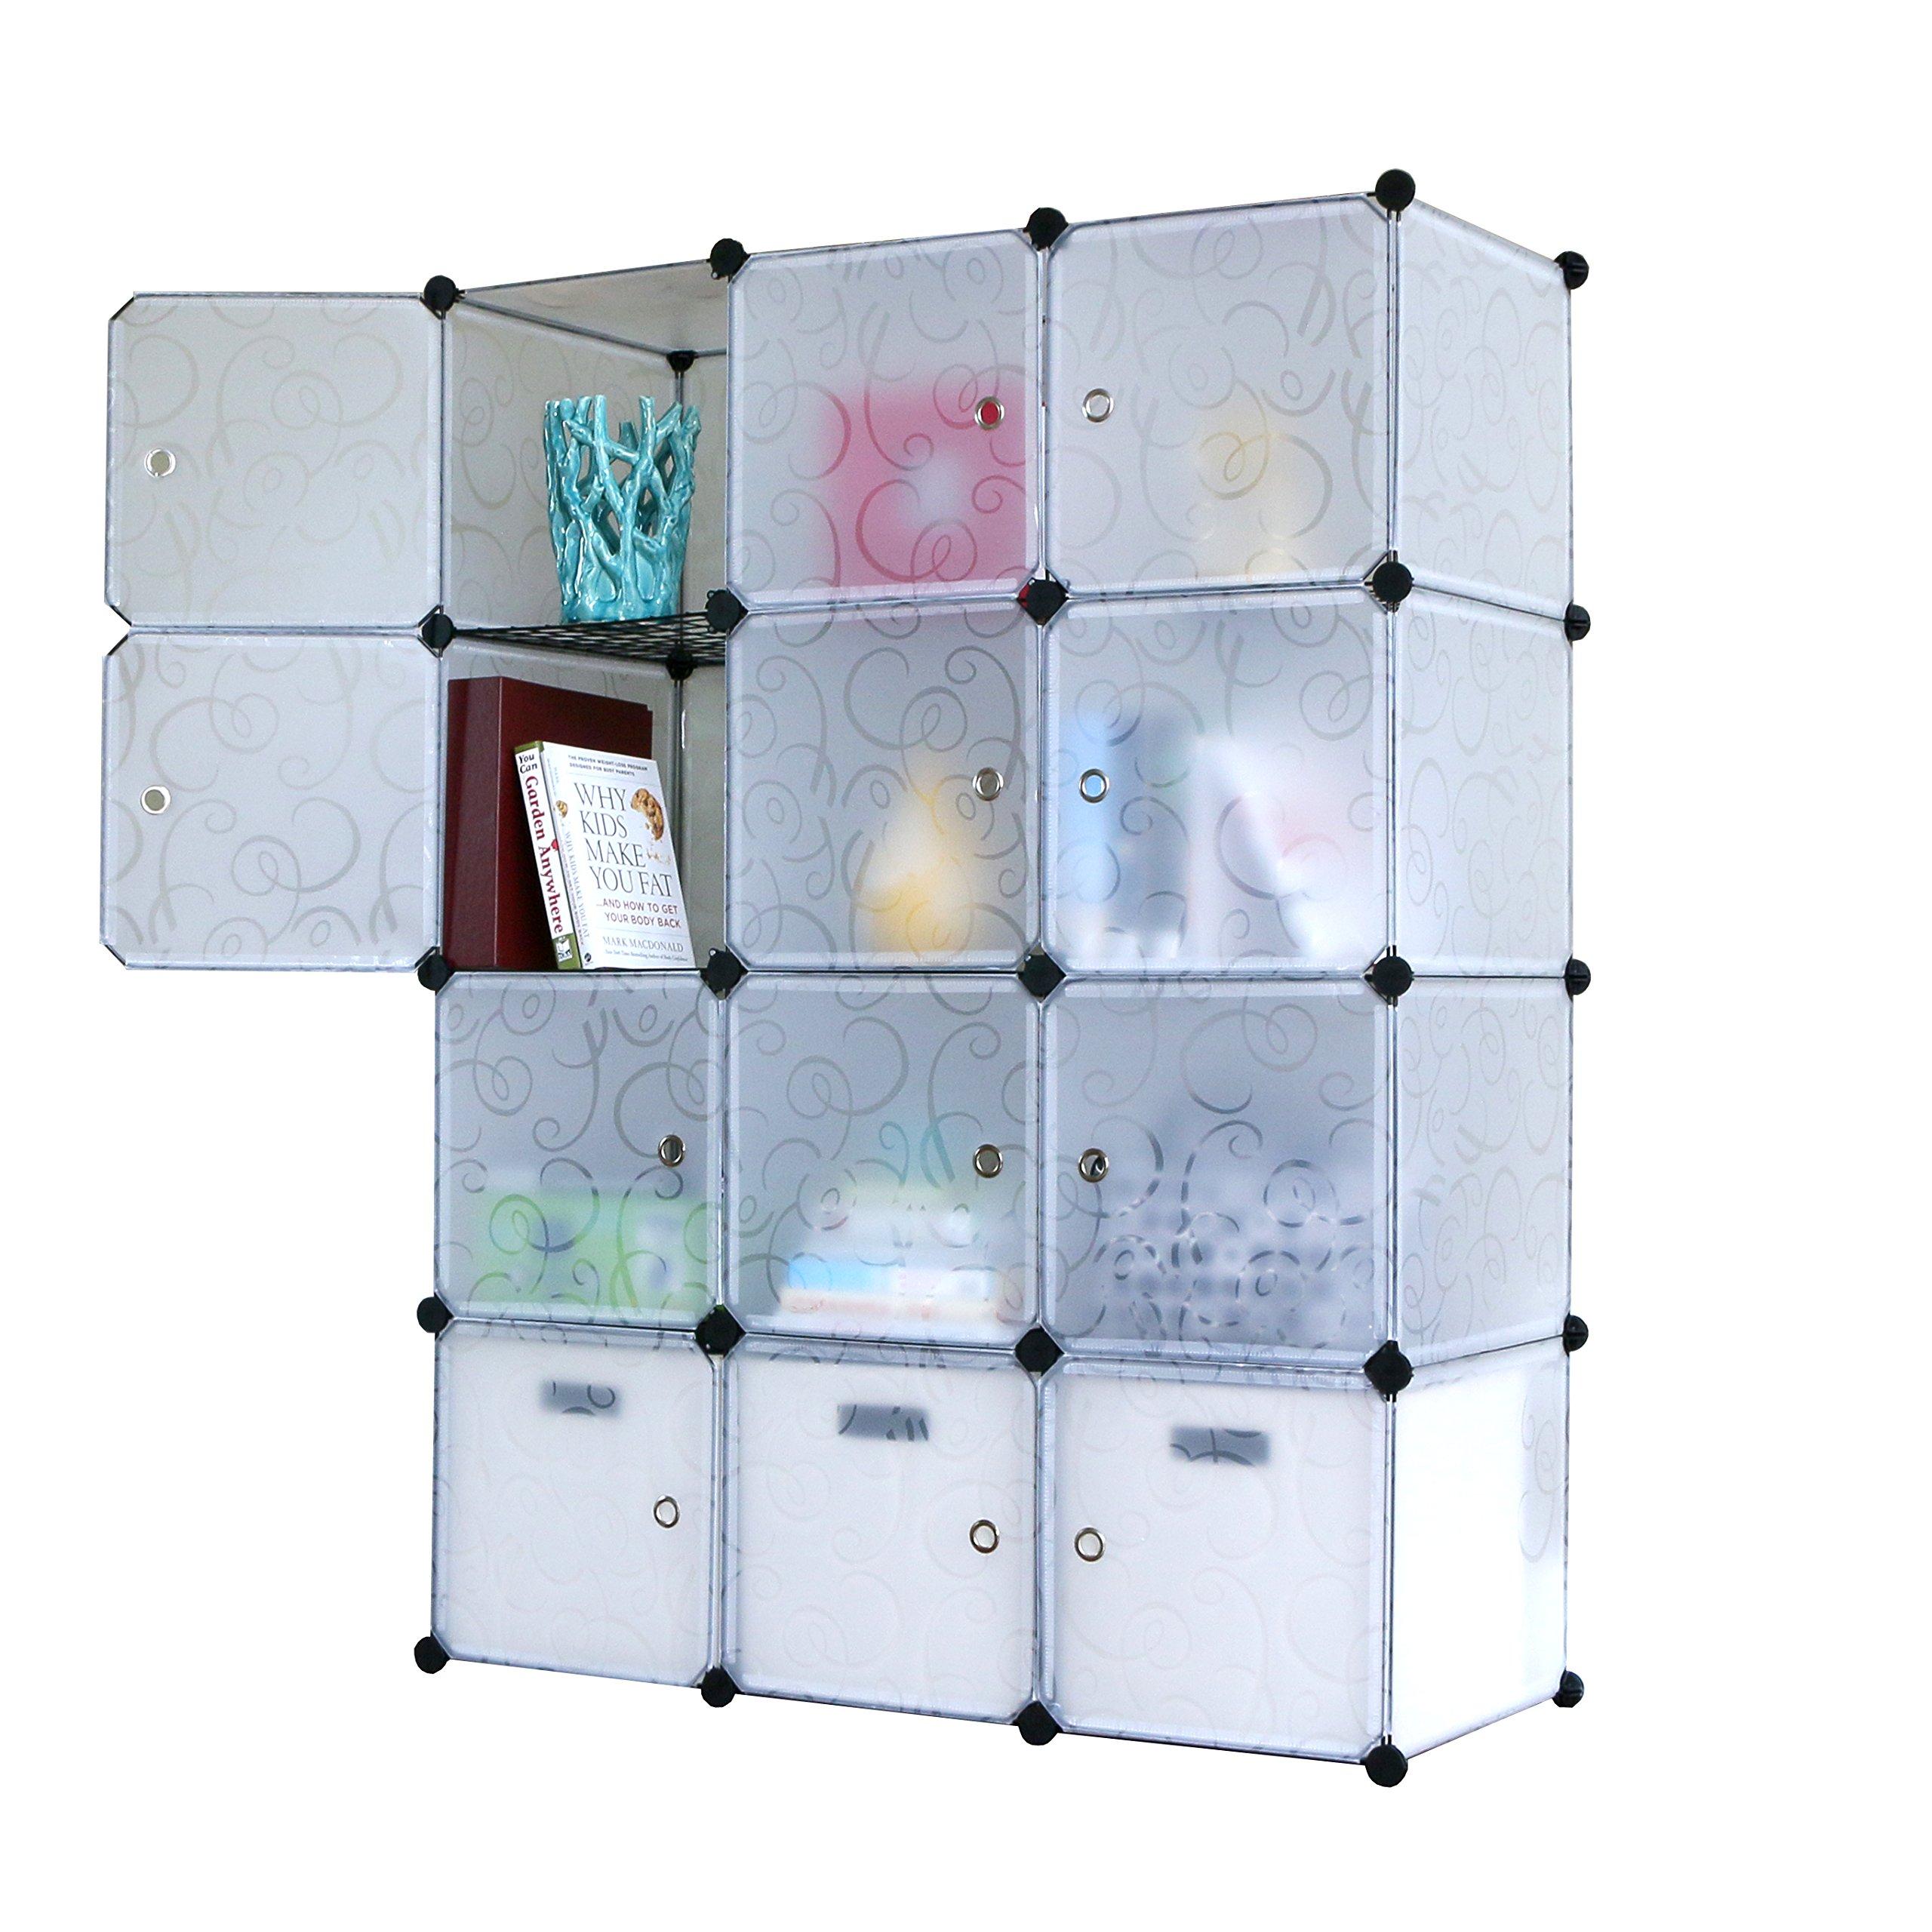 UNICOO - Multi Use DIY 12 Cube Organizer, Bookcase, Storage Cabinet, Wardrobe Closet (Regular, Semi-Transparent)